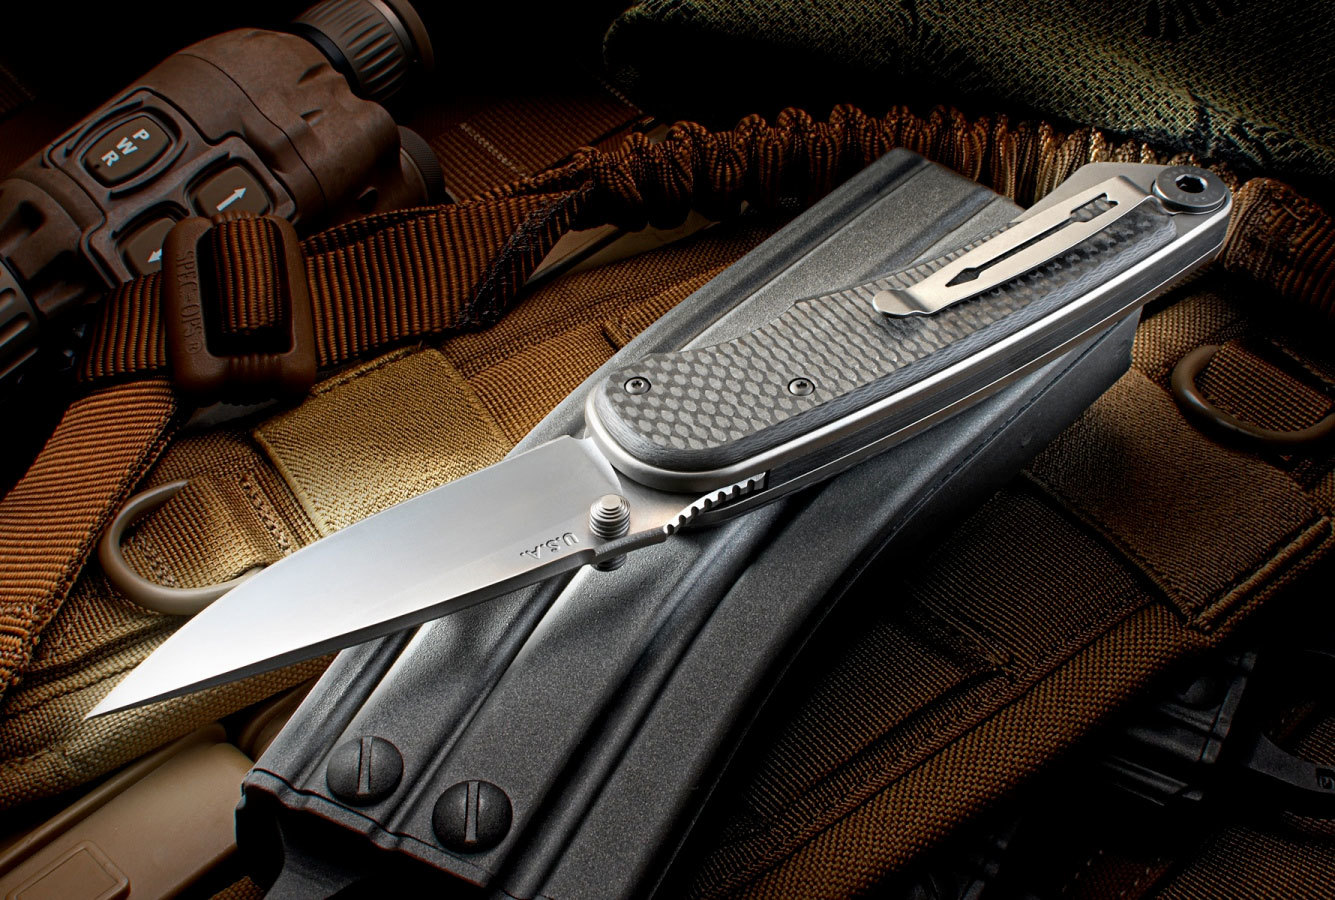 Фото 11 - Нож складной Spartan Blades Akribis Meteorite Grey, сталь CPM-S35VN, рукоять титан/карбон